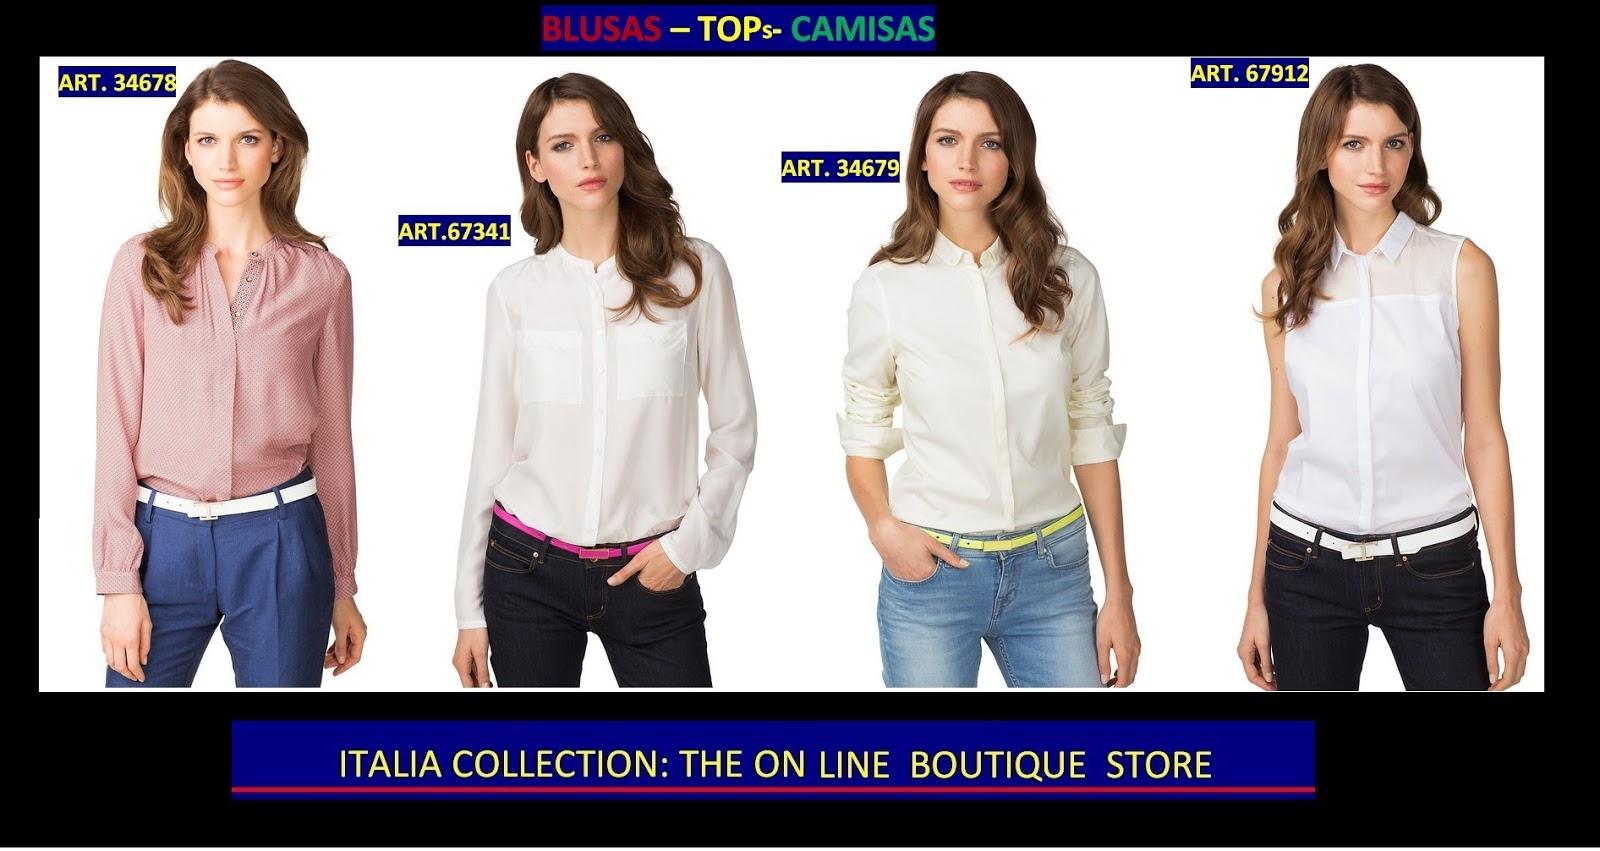 Camisas de vestir / Camisas imagen corporativa / Camisas